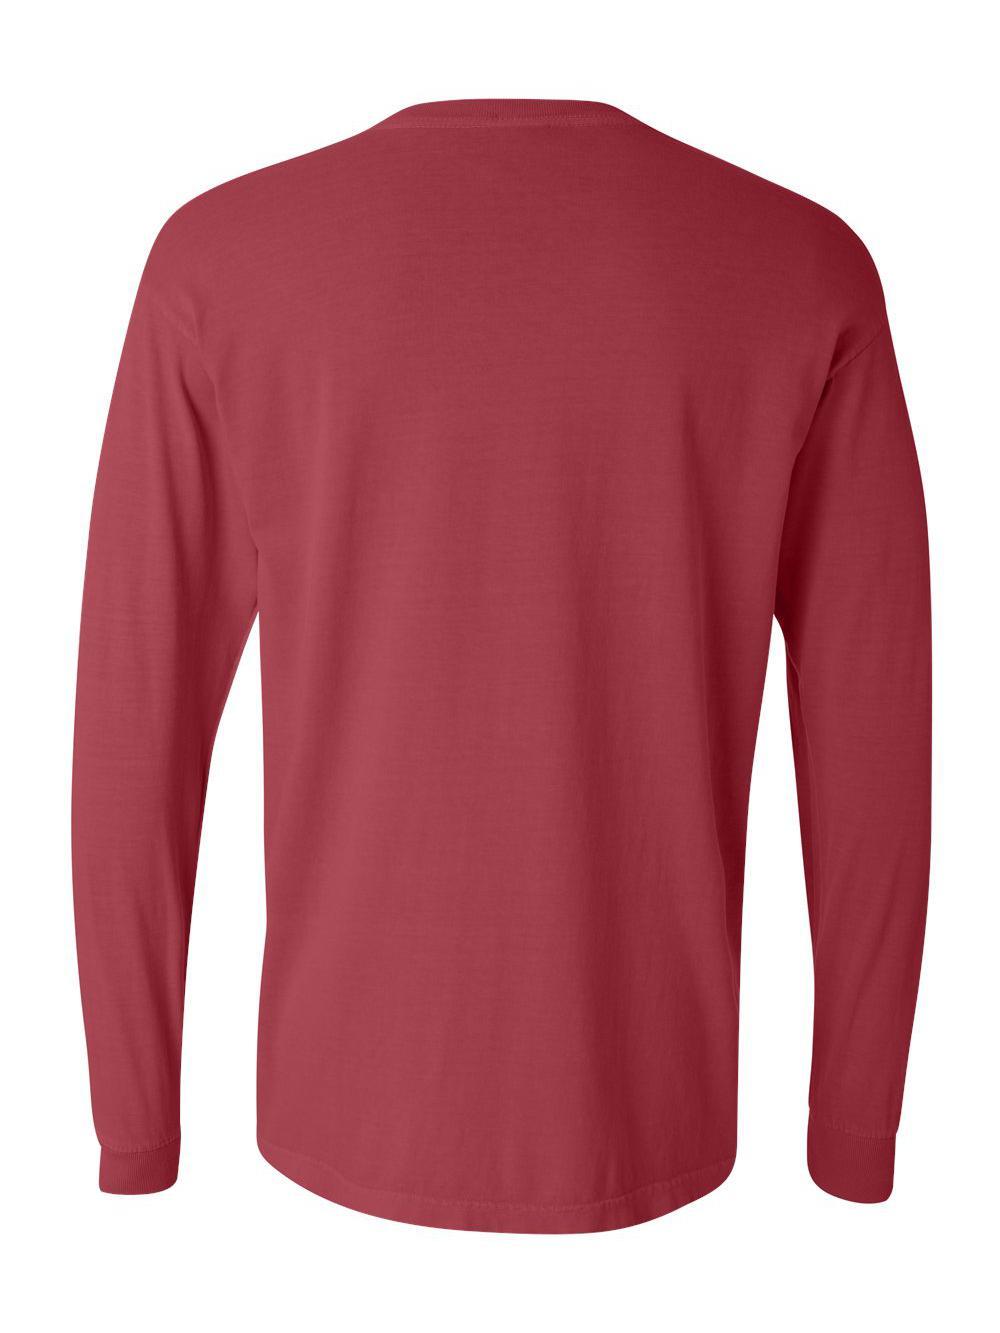 Comfort-Colors-Garment-Dyed-Heavyweight-Ringspun-Long-Sleeve-T-Shirt-6014 thumbnail 31